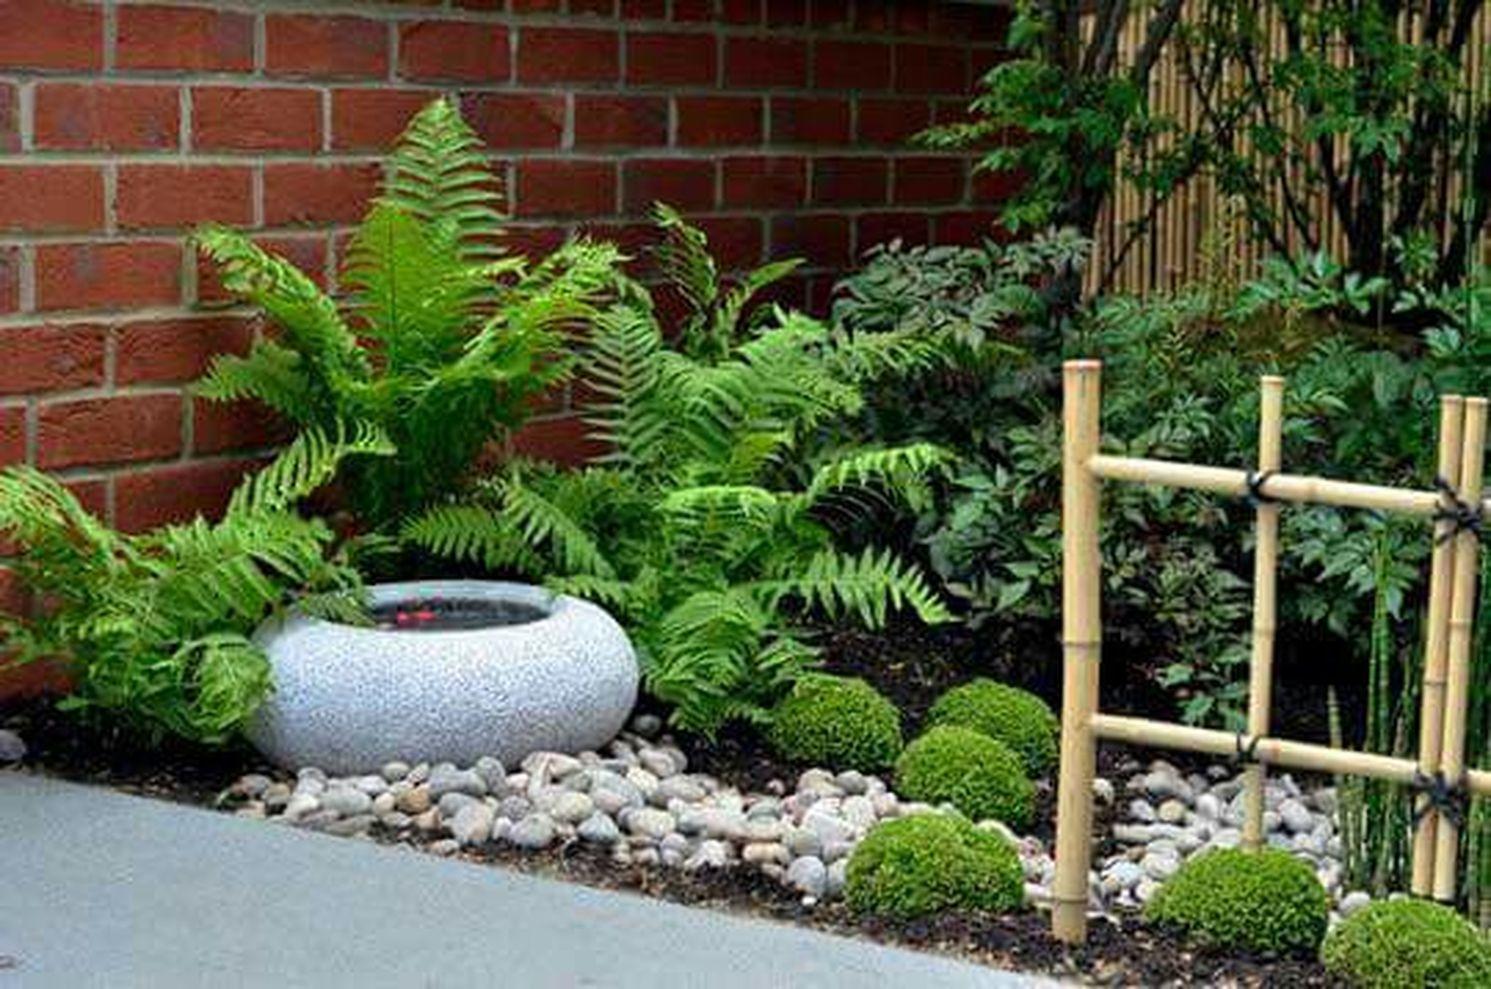 petit bassin et vegetation jardin